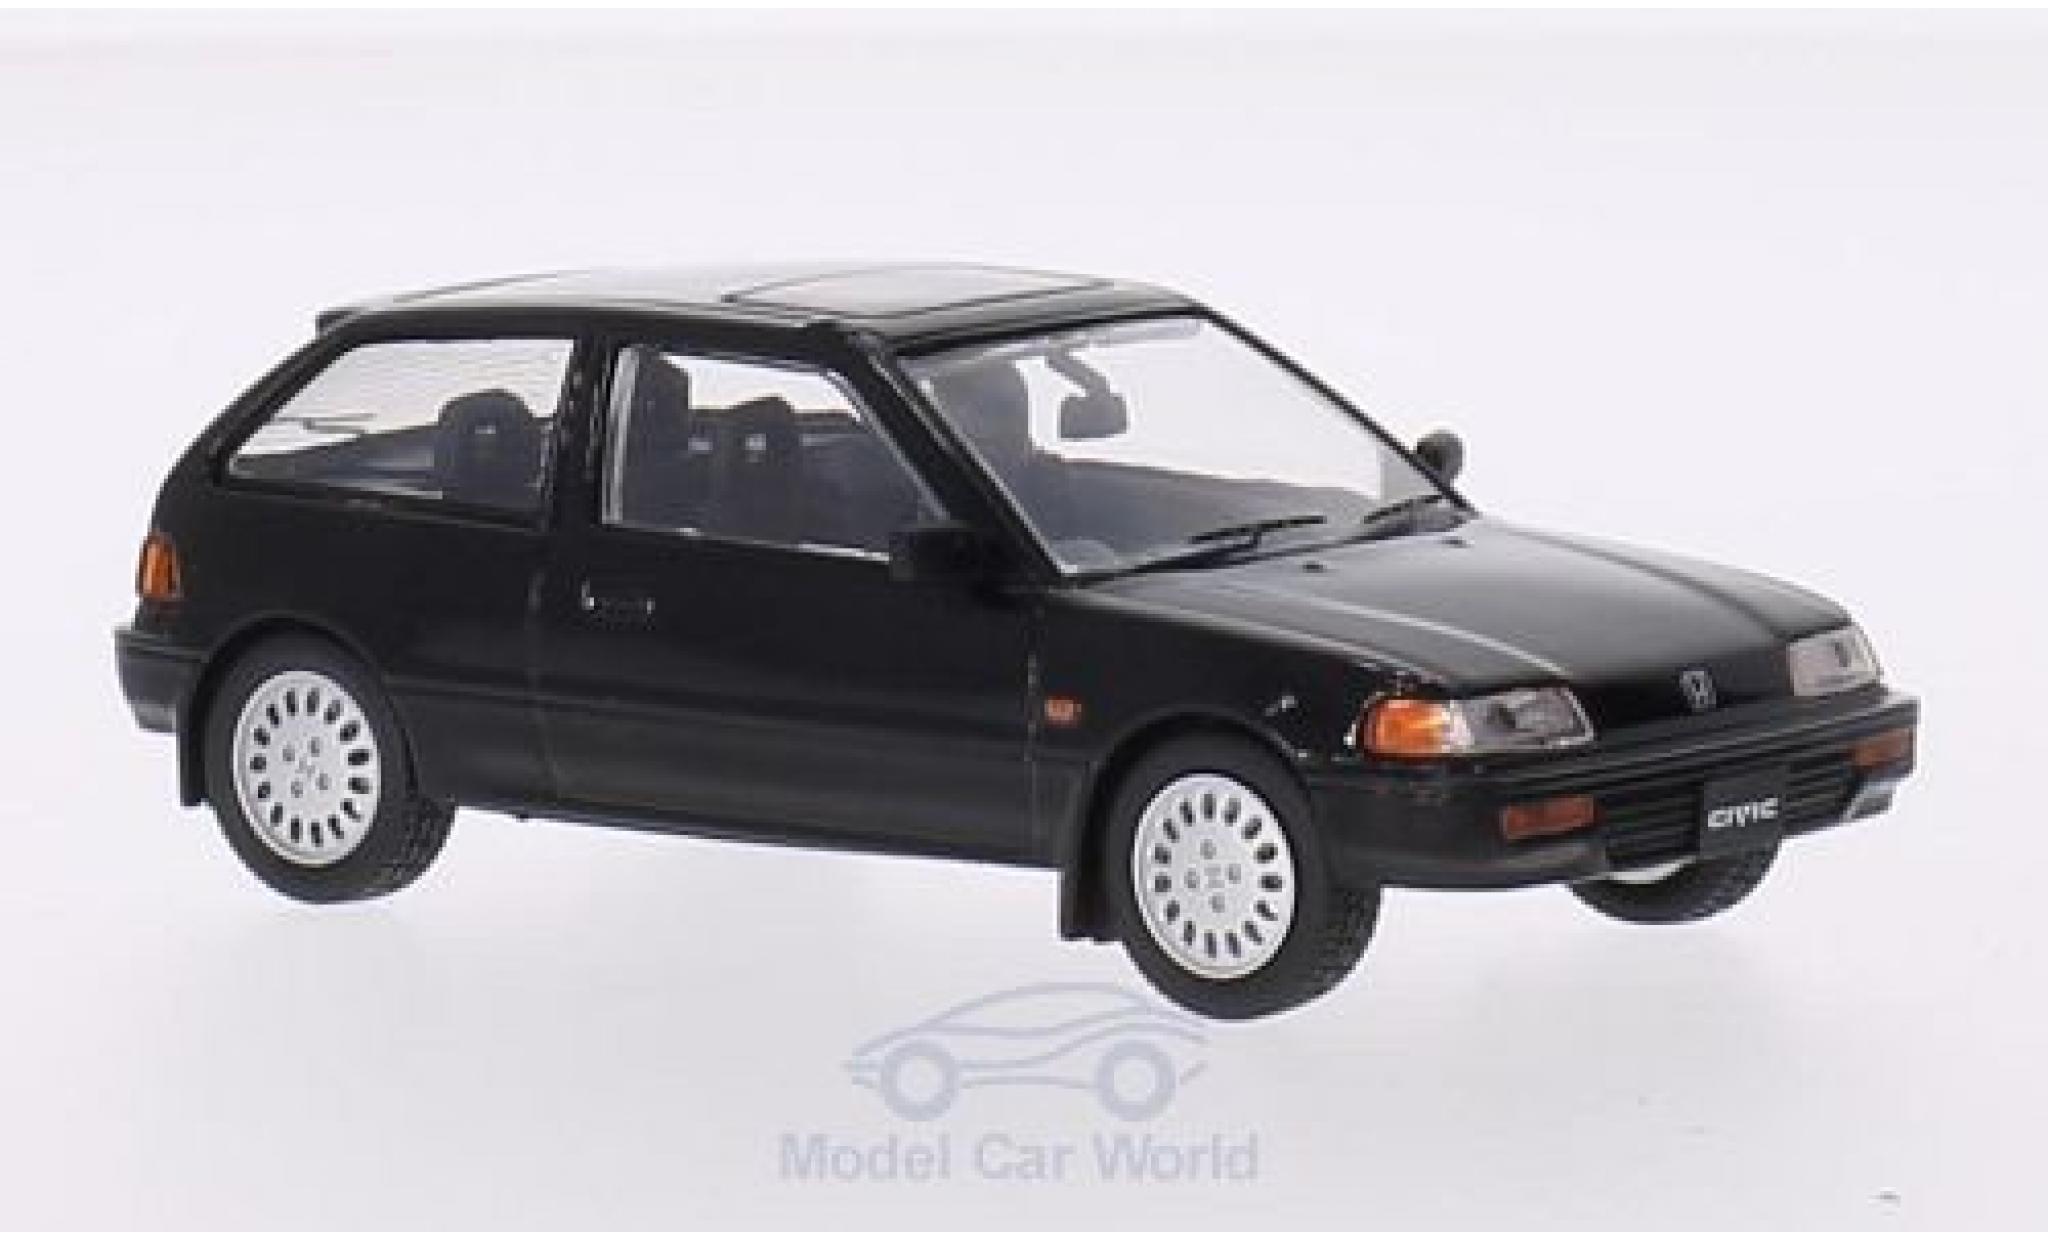 Honda Civic 1/43 Triple 9 Collection black RHD 1987